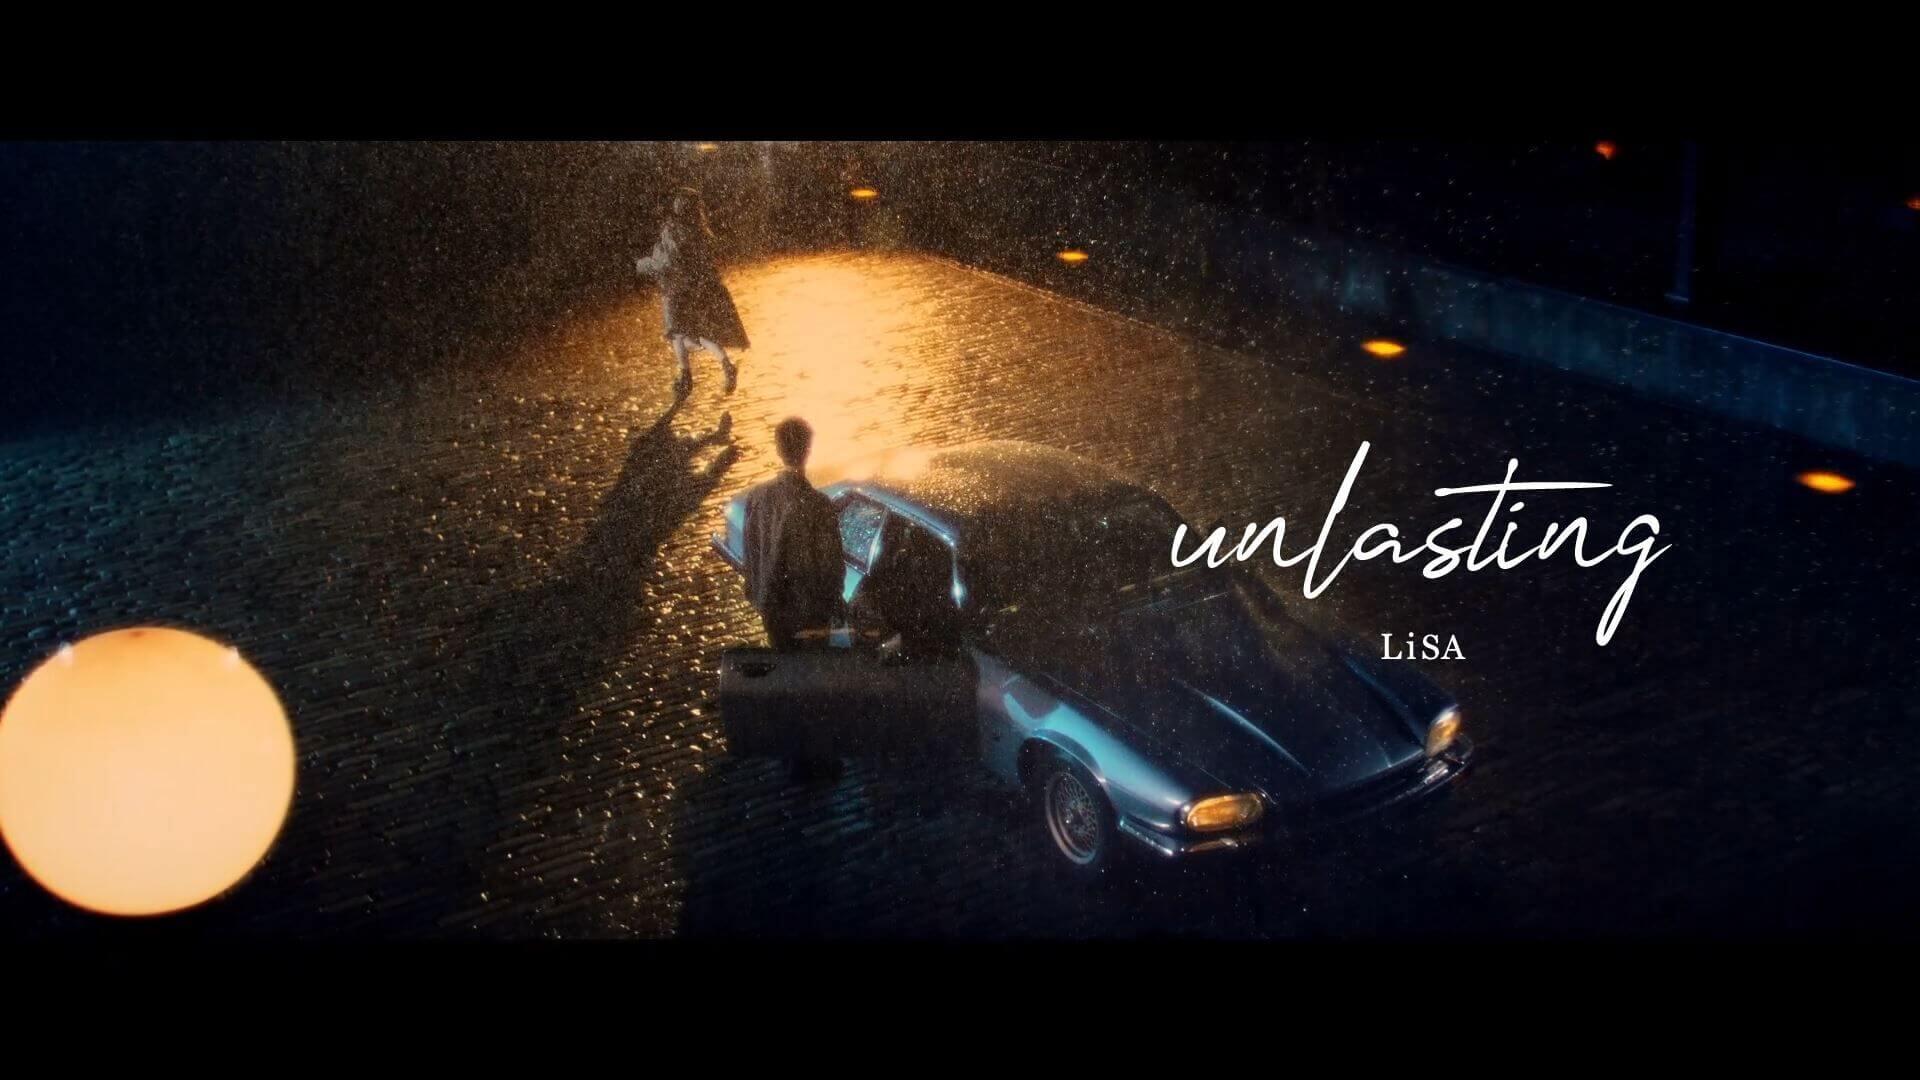 LiSA unlasting MV